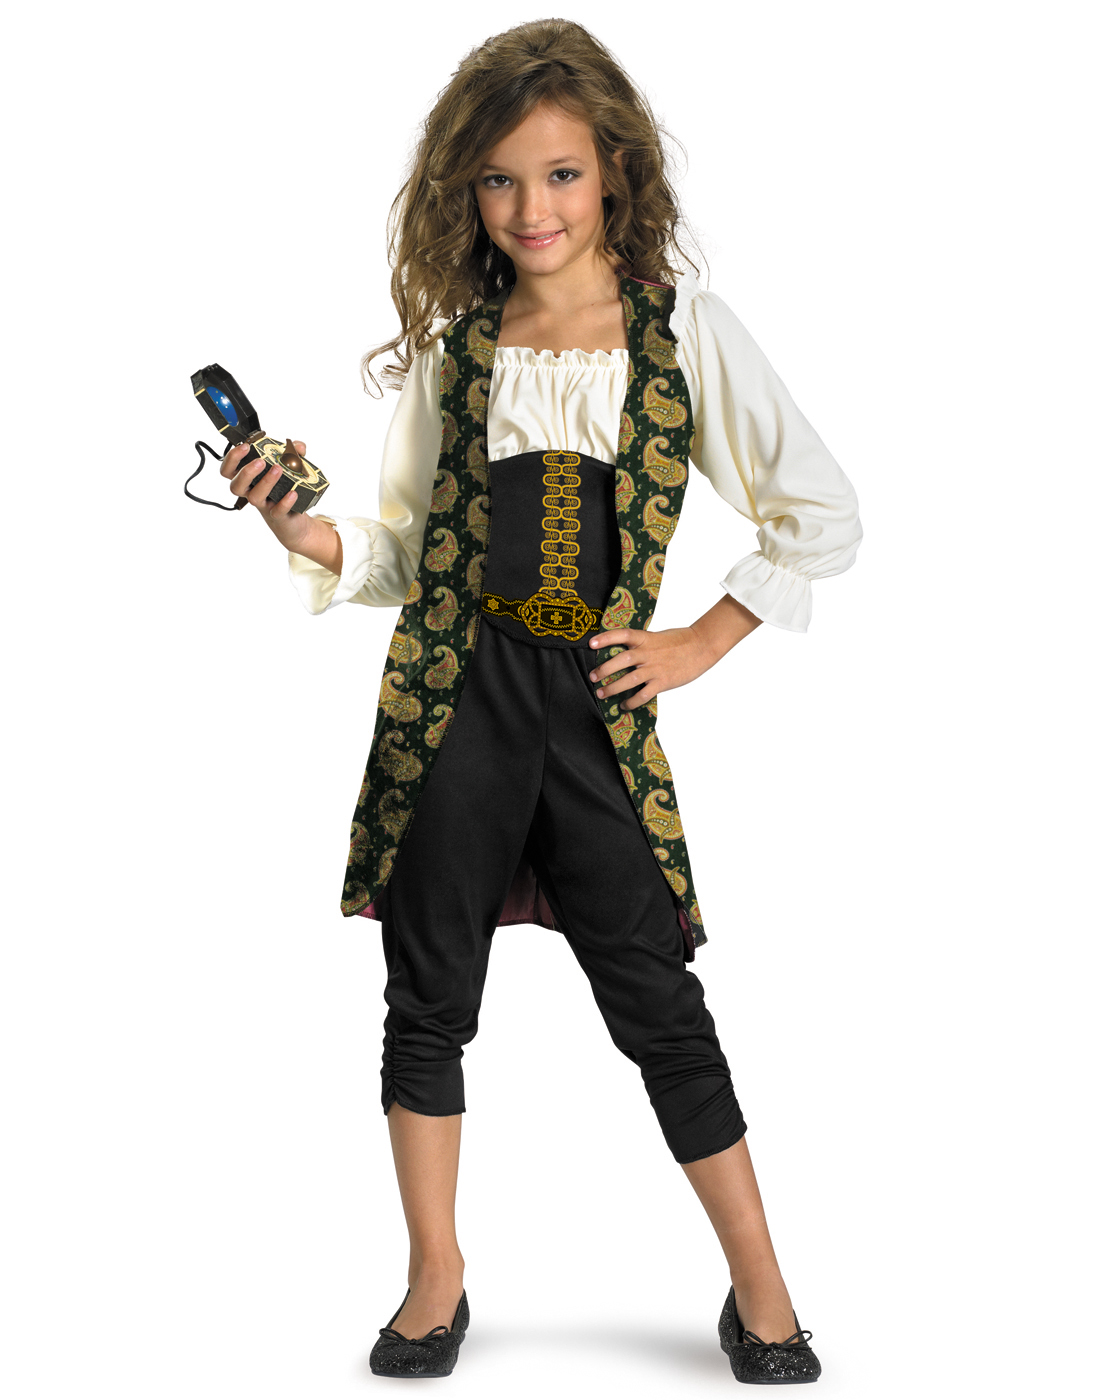 Angelica pirate costume